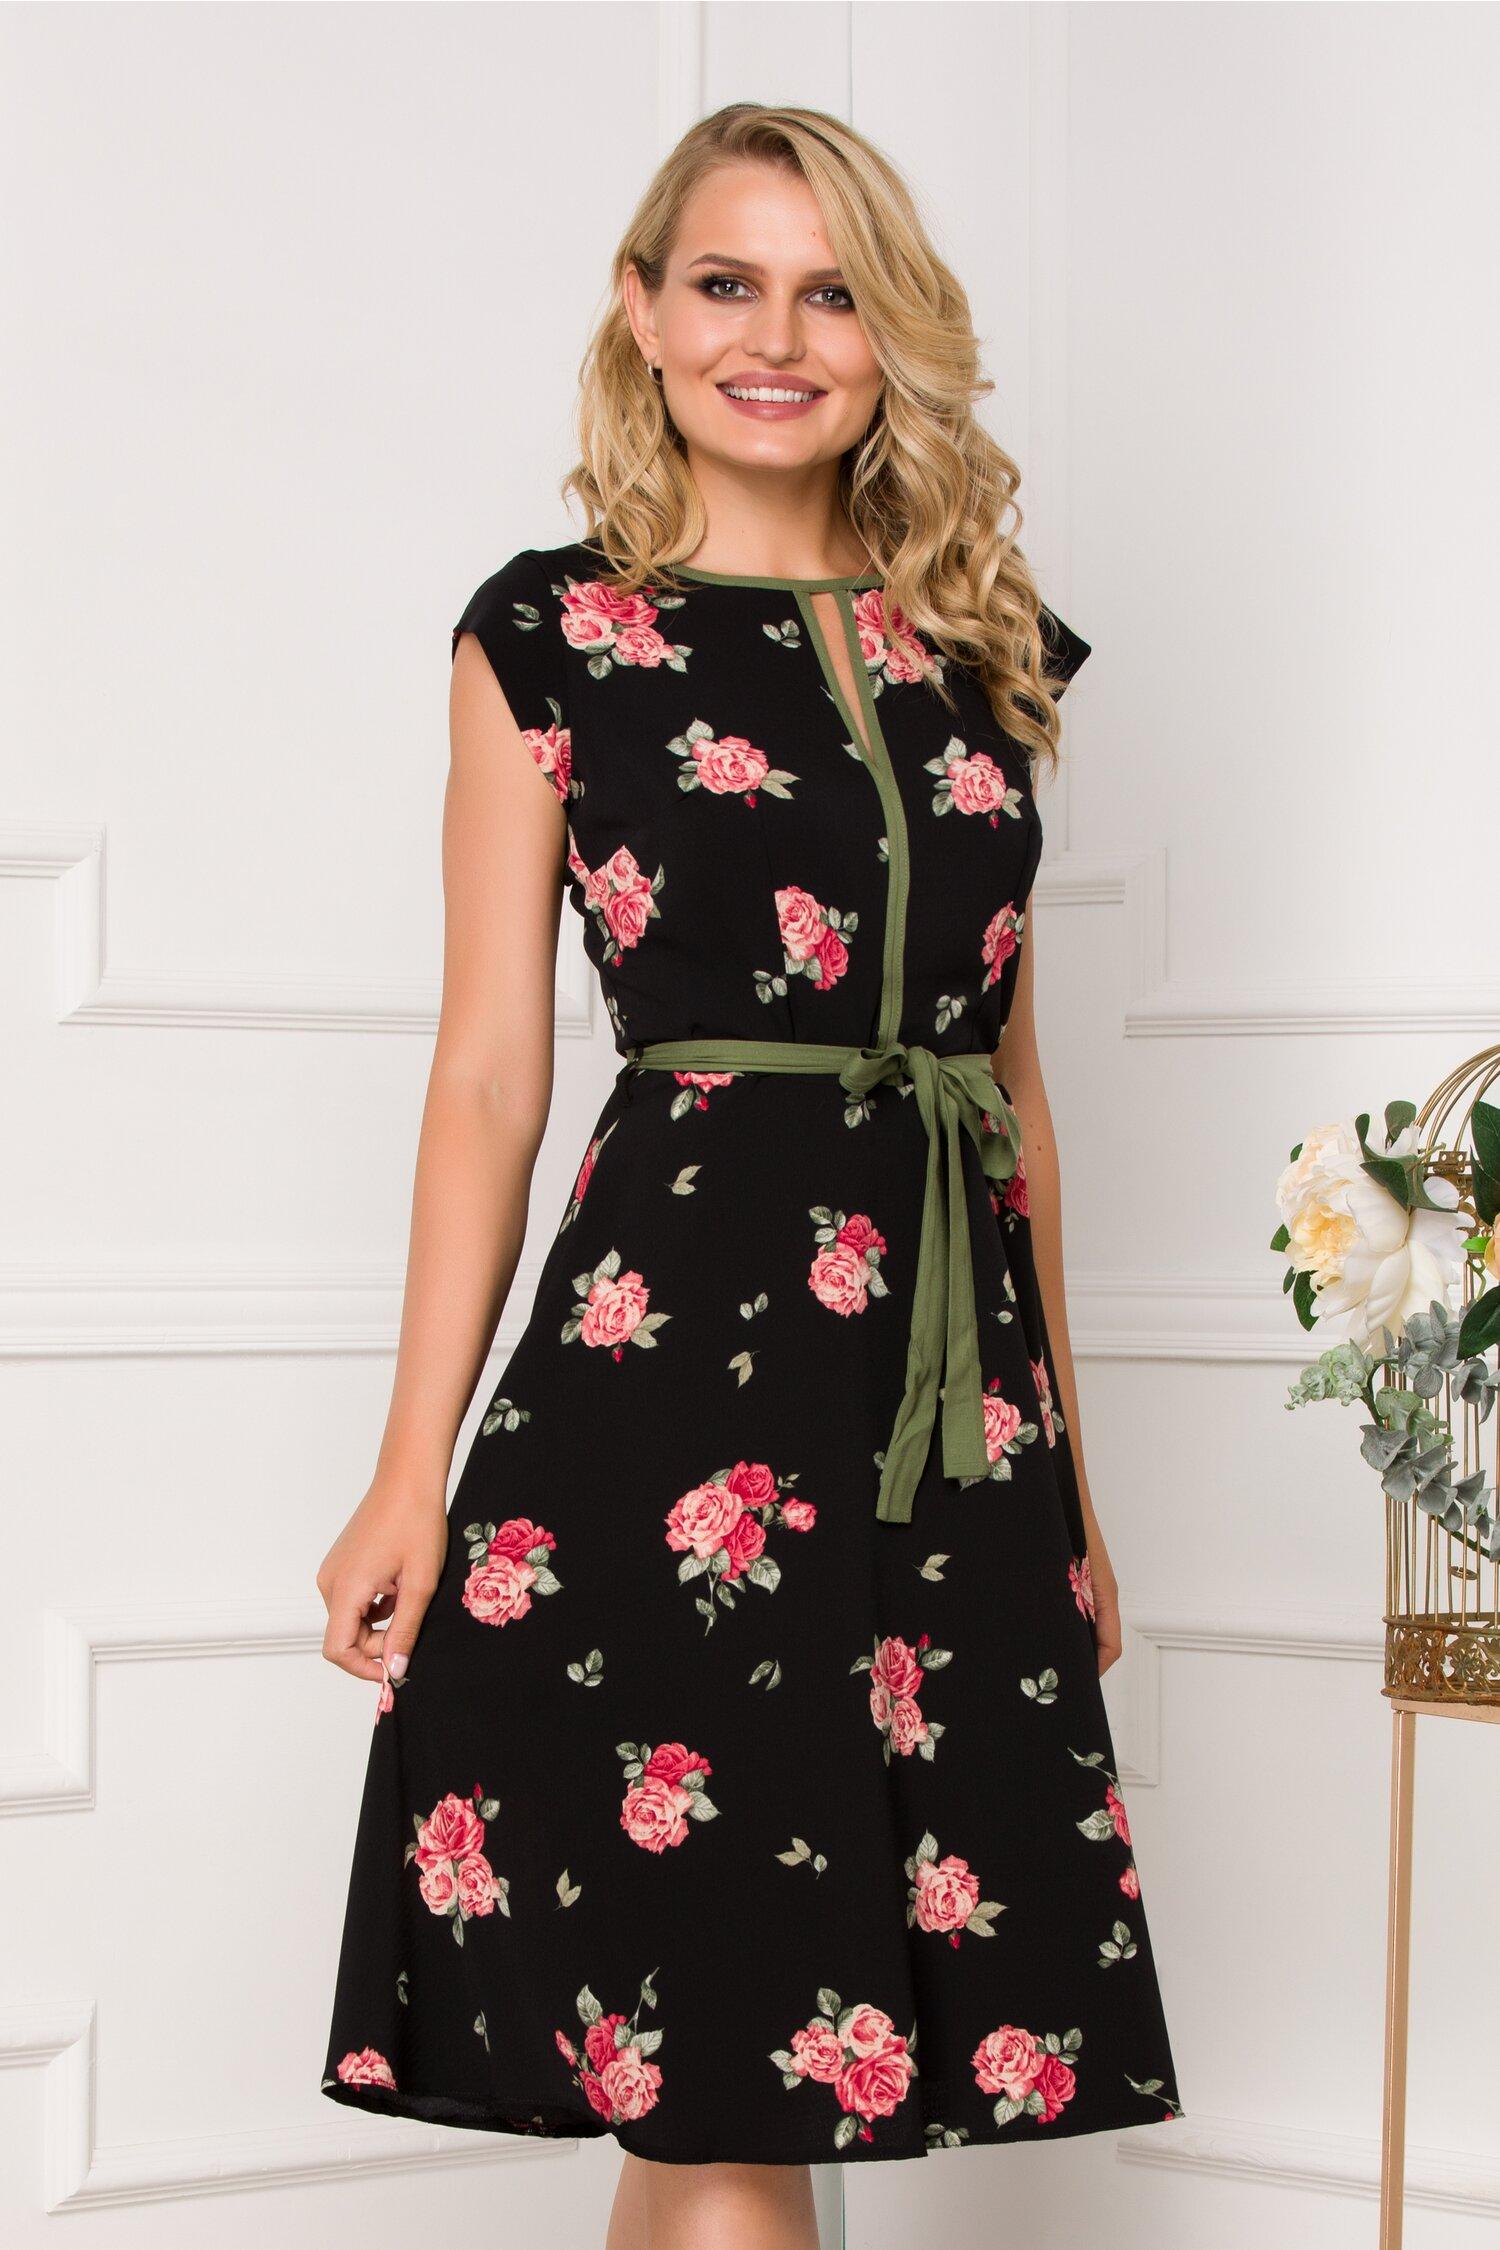 Rochie Nina neagra cu imprimeu floral in nuante de rosu si kaki